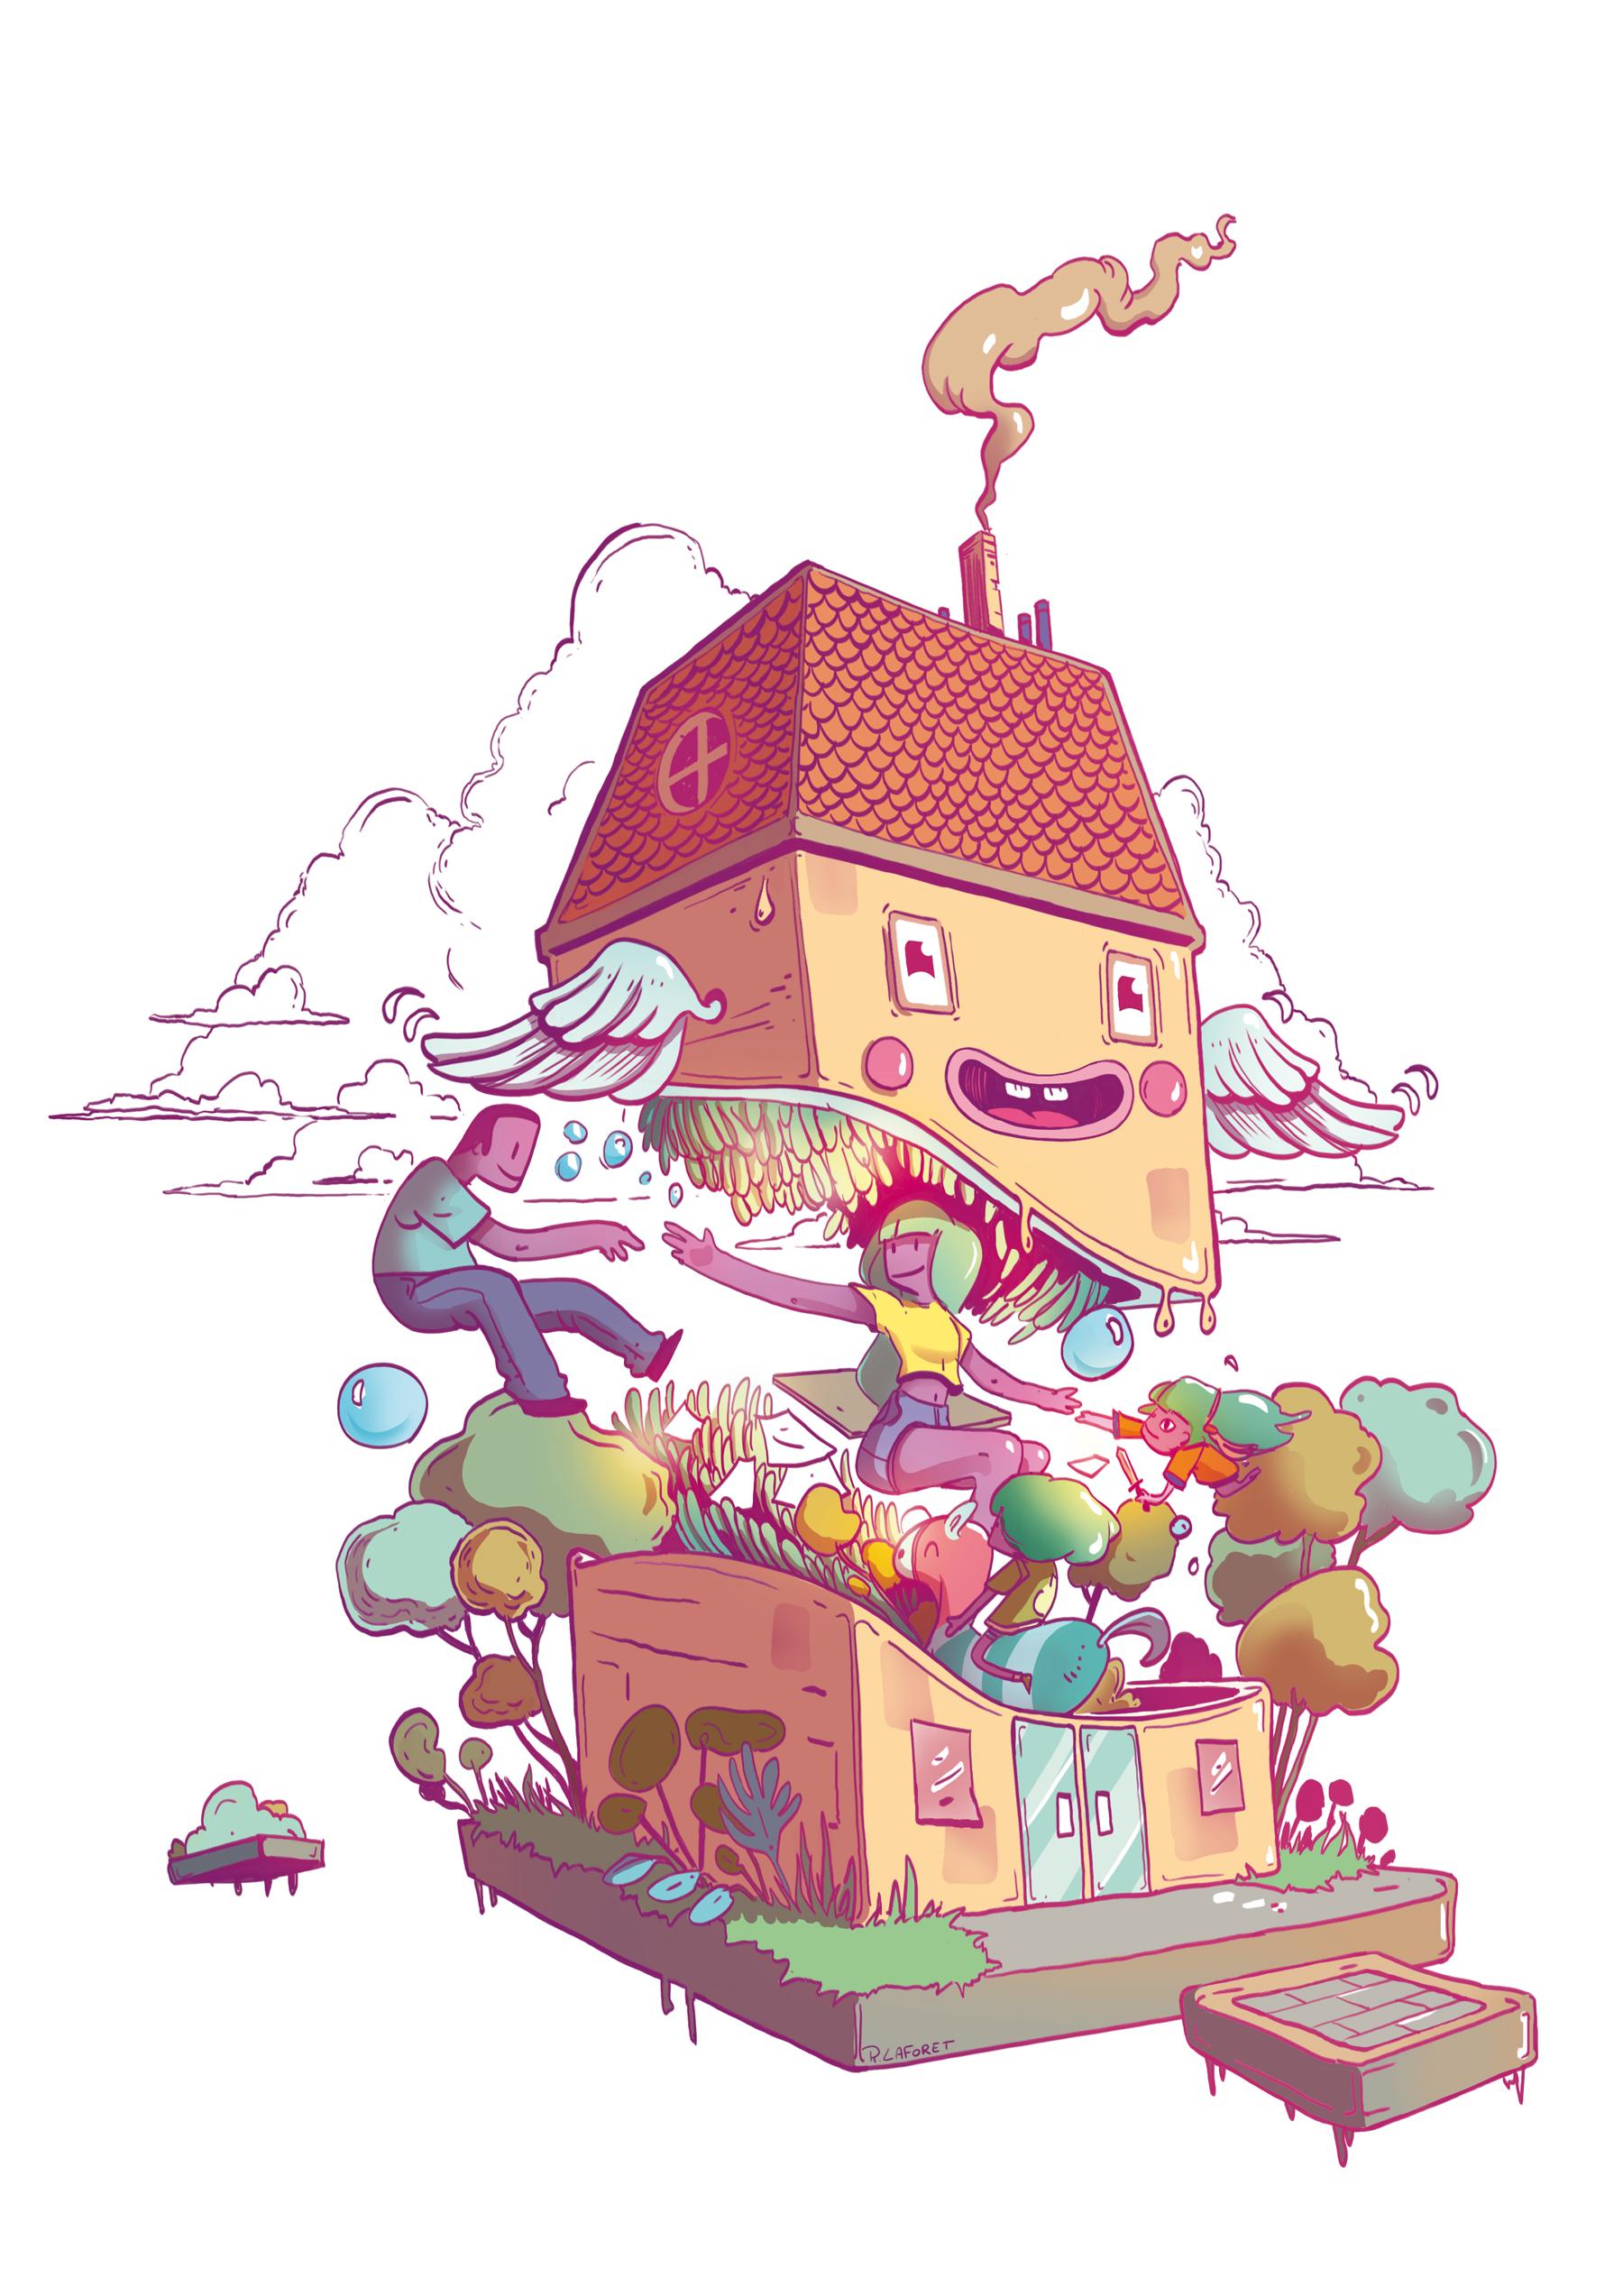 Maison Volante - Illustration - Romain Laforet